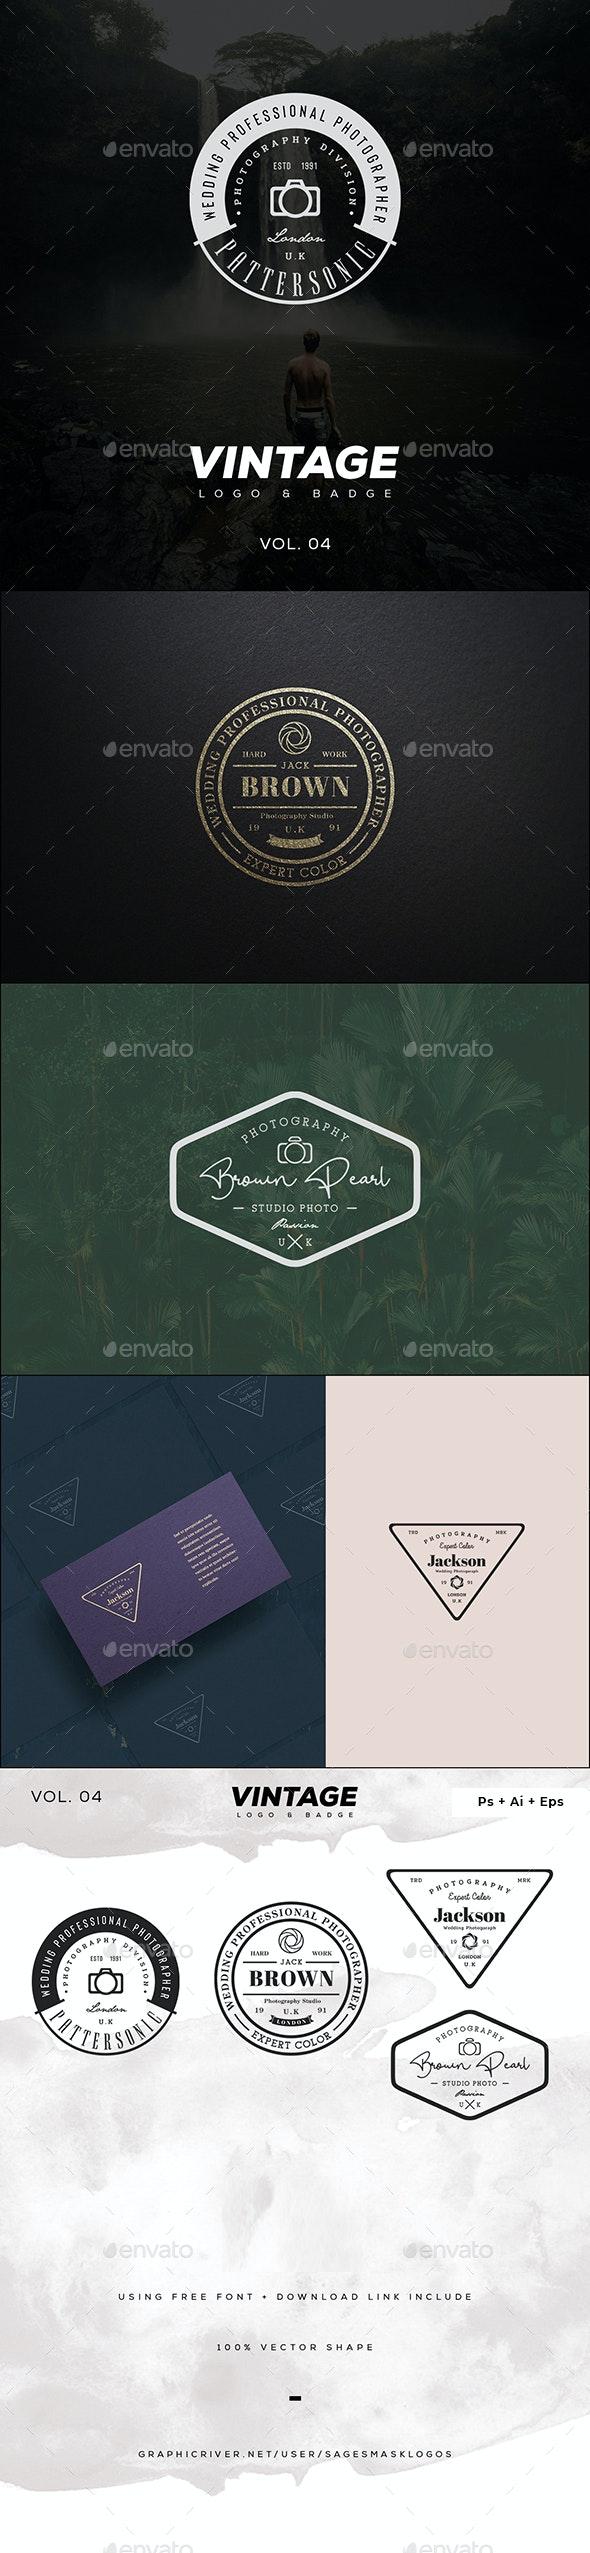 Vintage Logo & Badge Vol. 5 - Badges & Stickers Web Elements